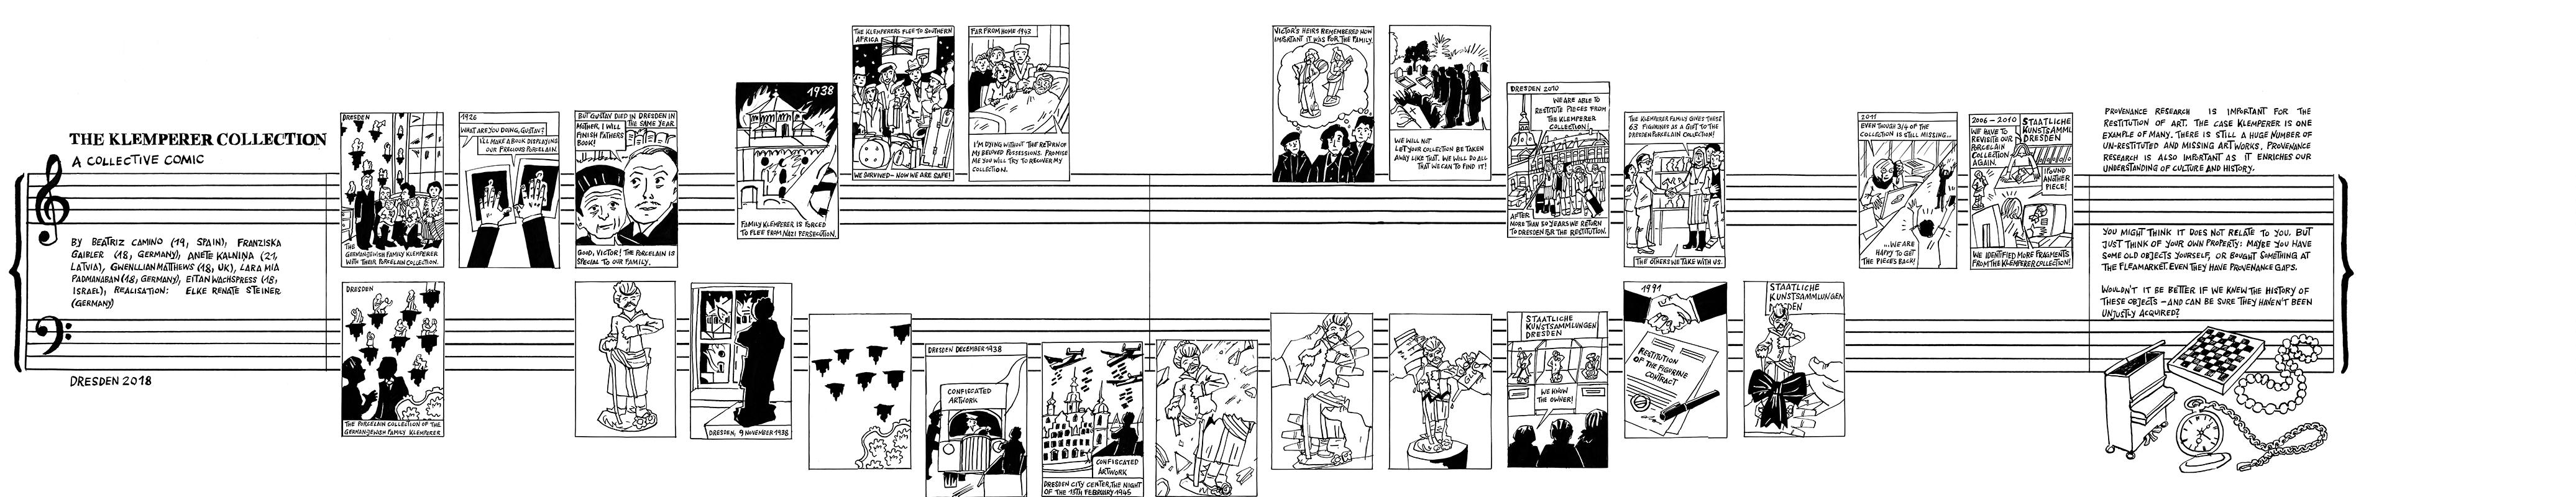 Interaktiver Comic